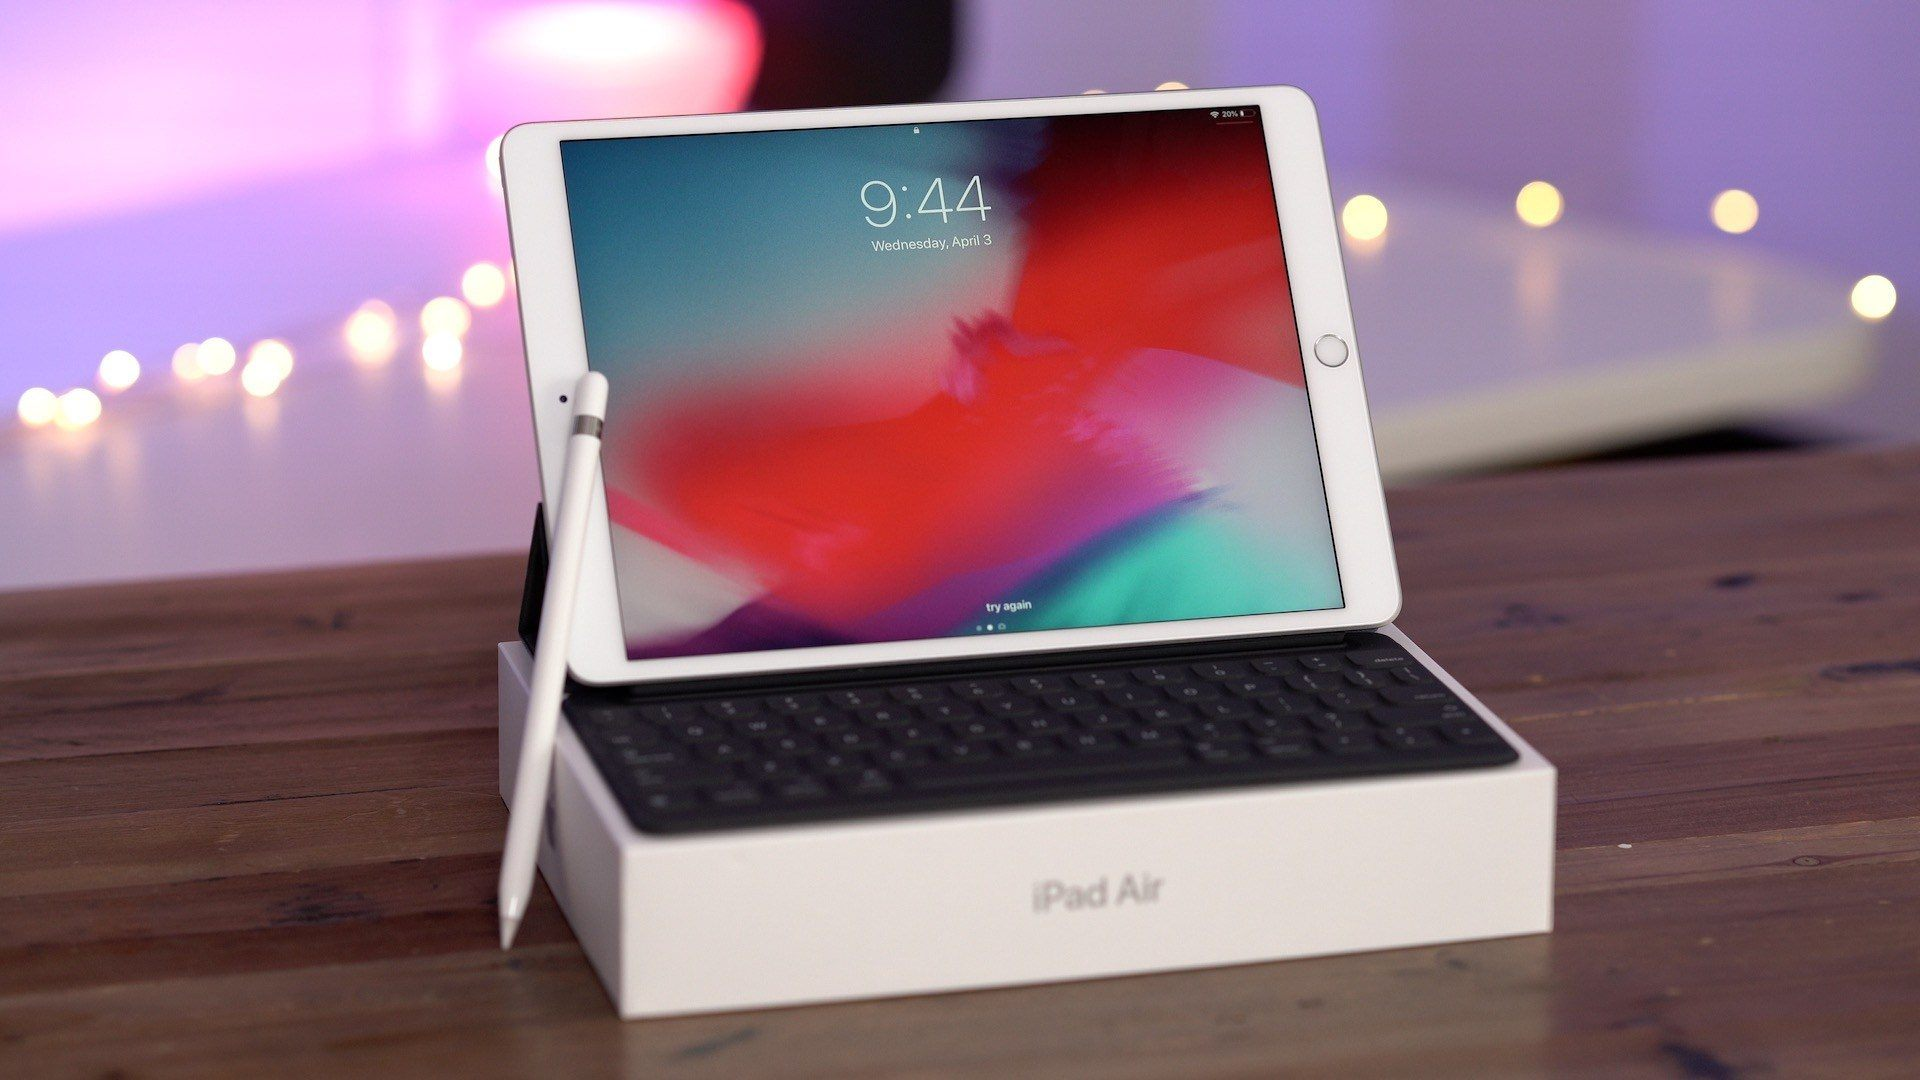 iPad-Air-3-Review-9to5Mac